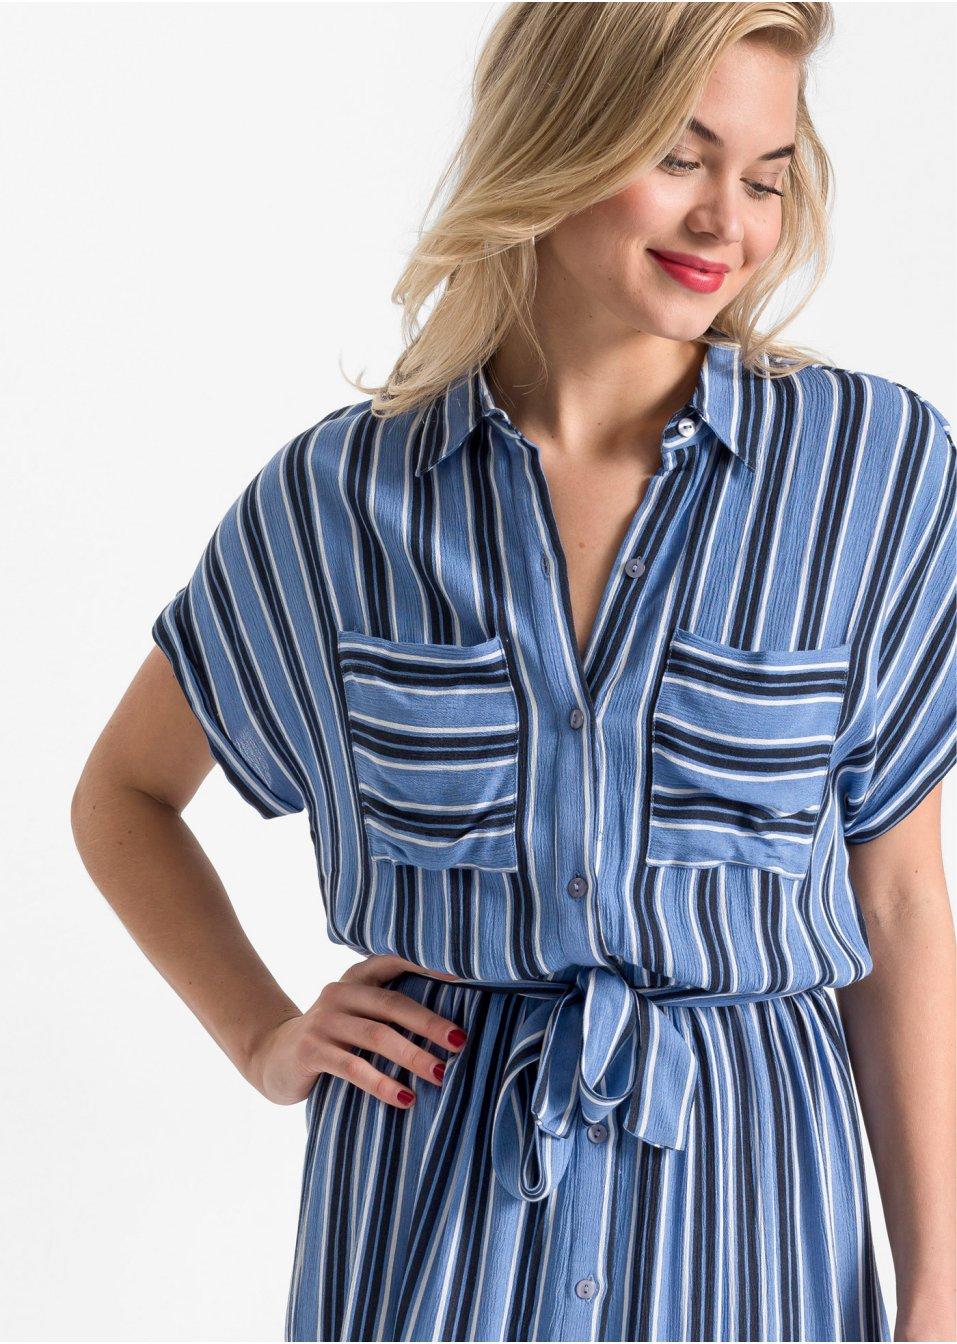 Mode Femme Vêtements DJLfdOFlkj Robe-chemise cool avec ceinture bleu foncé/bleu cristal/blanc cassé rayé